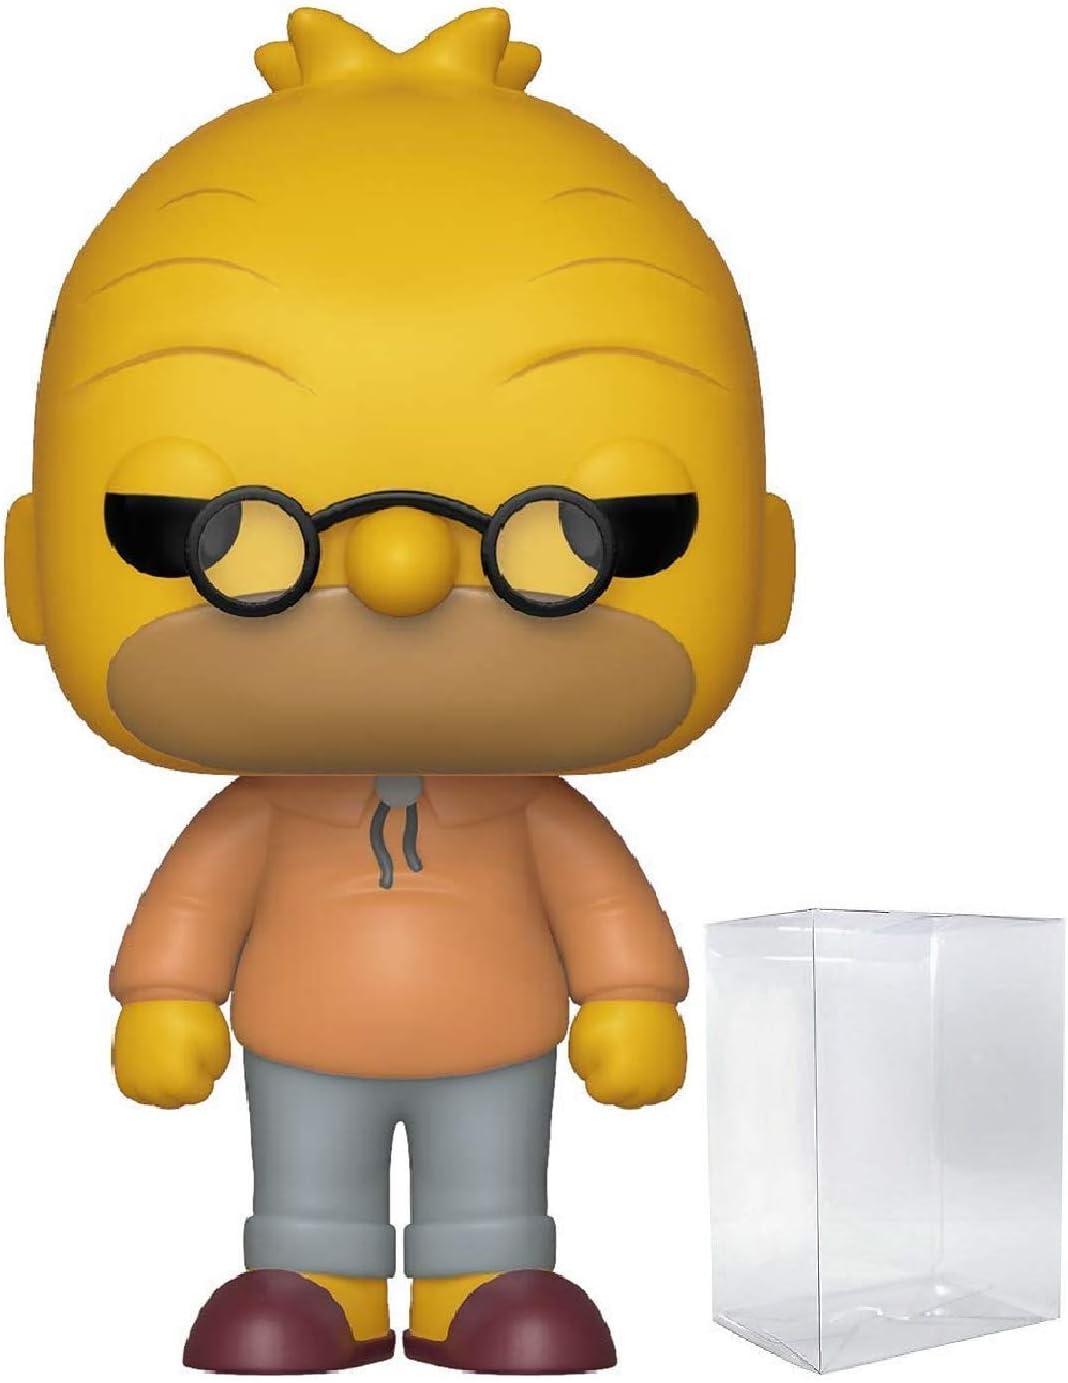 Amazon Com Funko The Simpsons Grandpa Simpson Abe Simpson Funko Pop Vinyl Figure Includes Compatible Pop Box Protector Case Toys Games